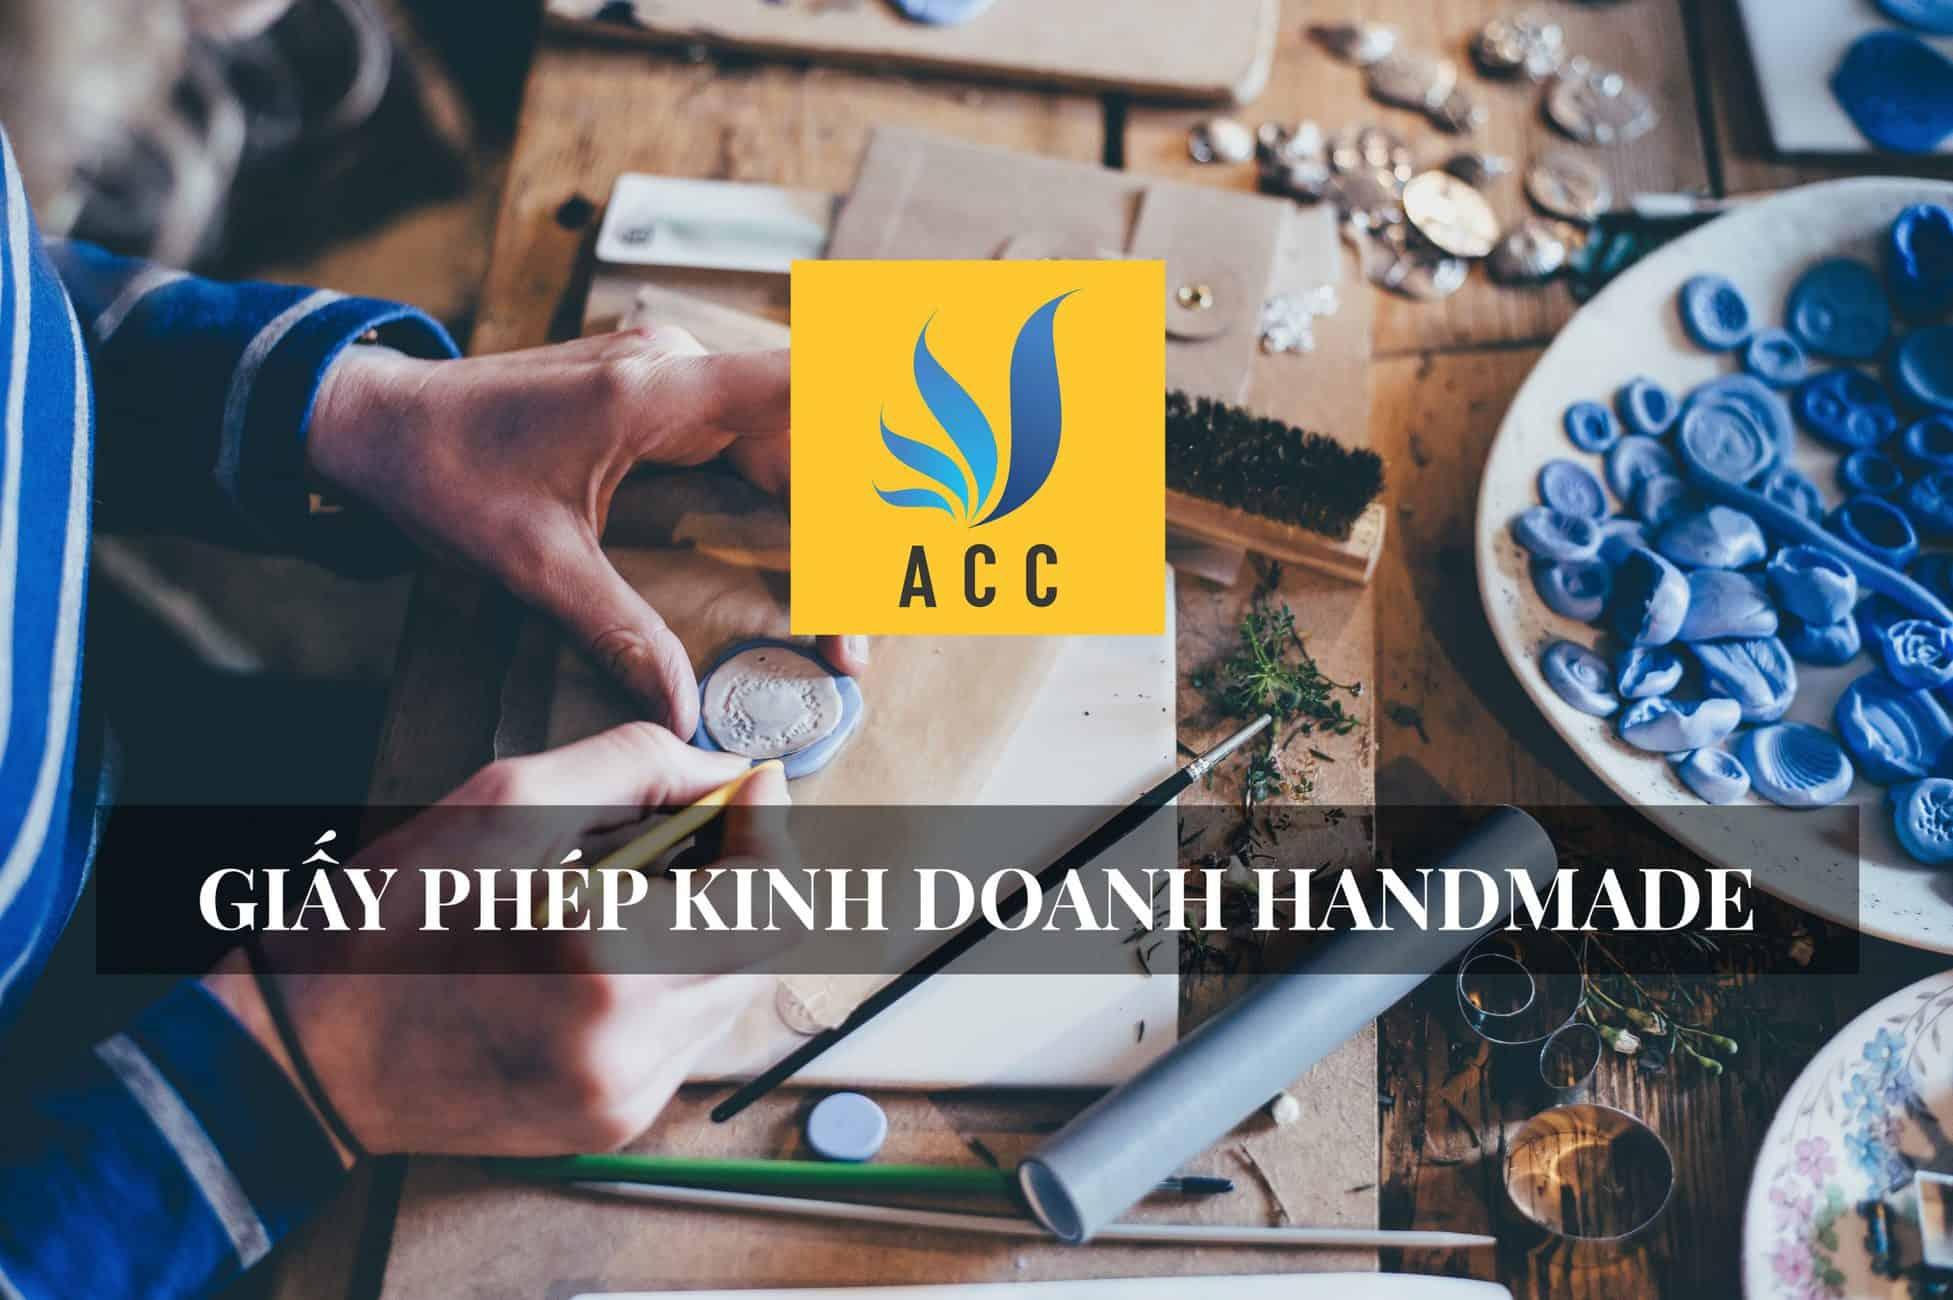 giấy phép kinh doanh handmade